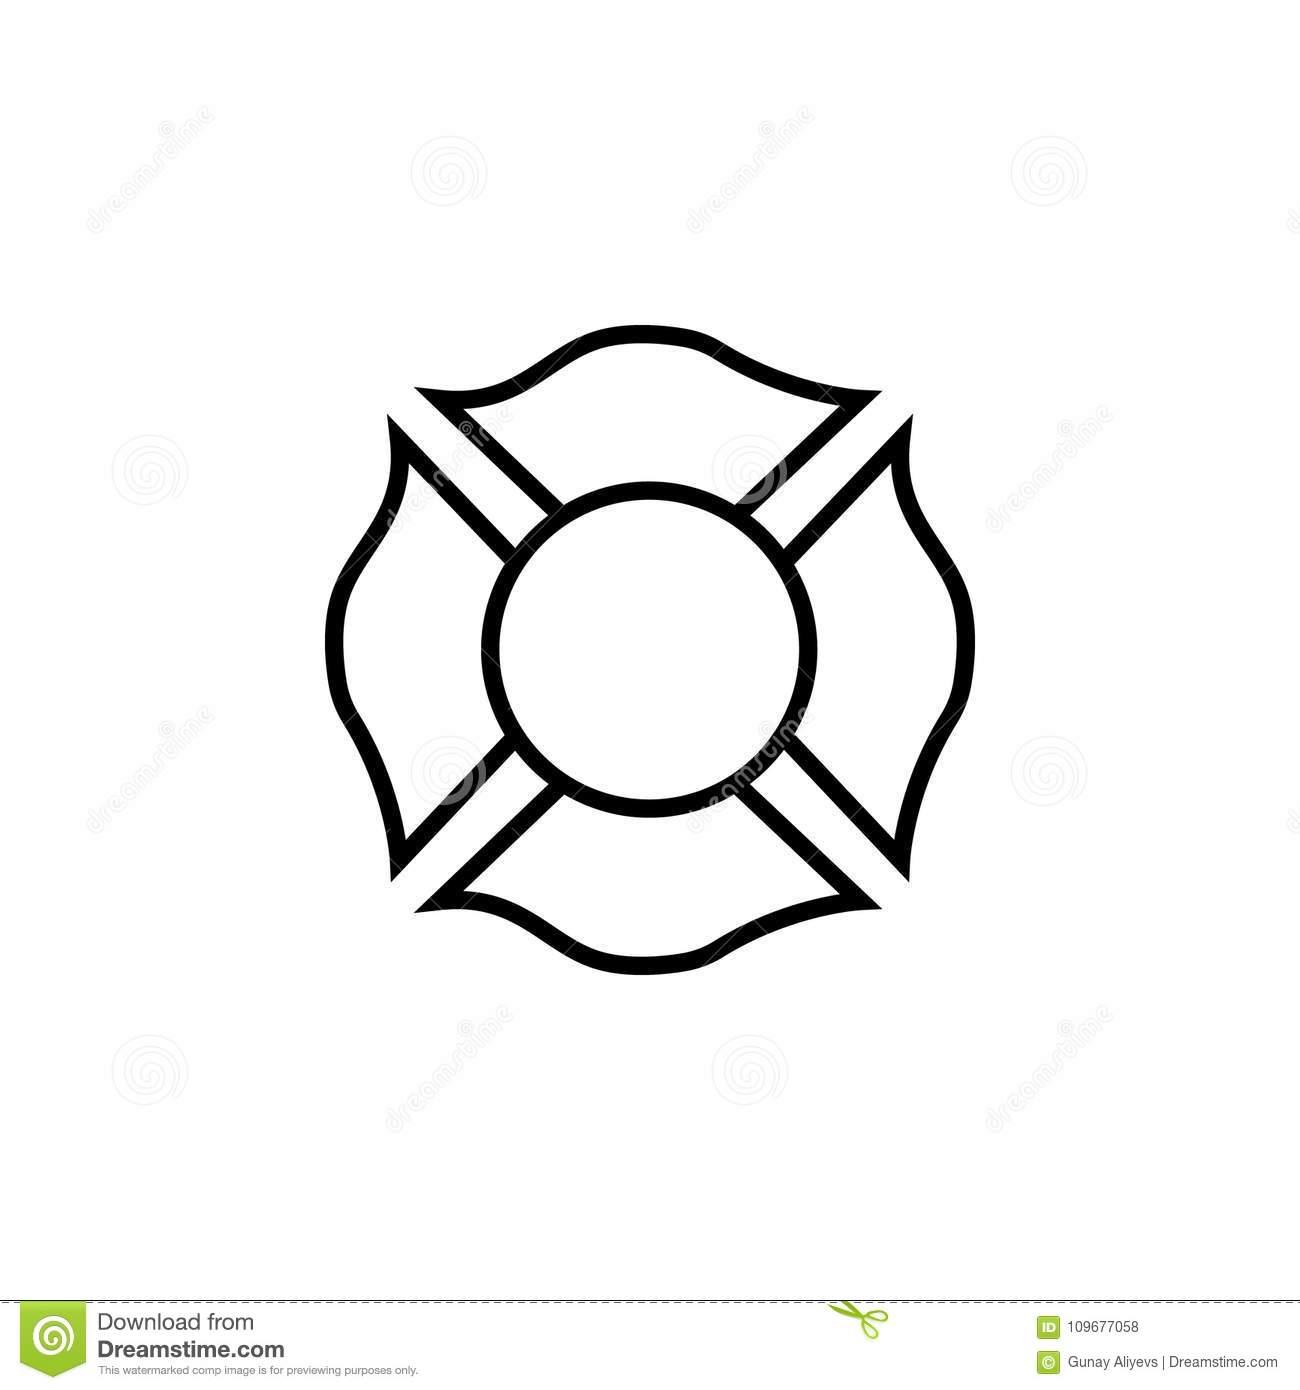 Firefighter Emblem Stock Illustrations.